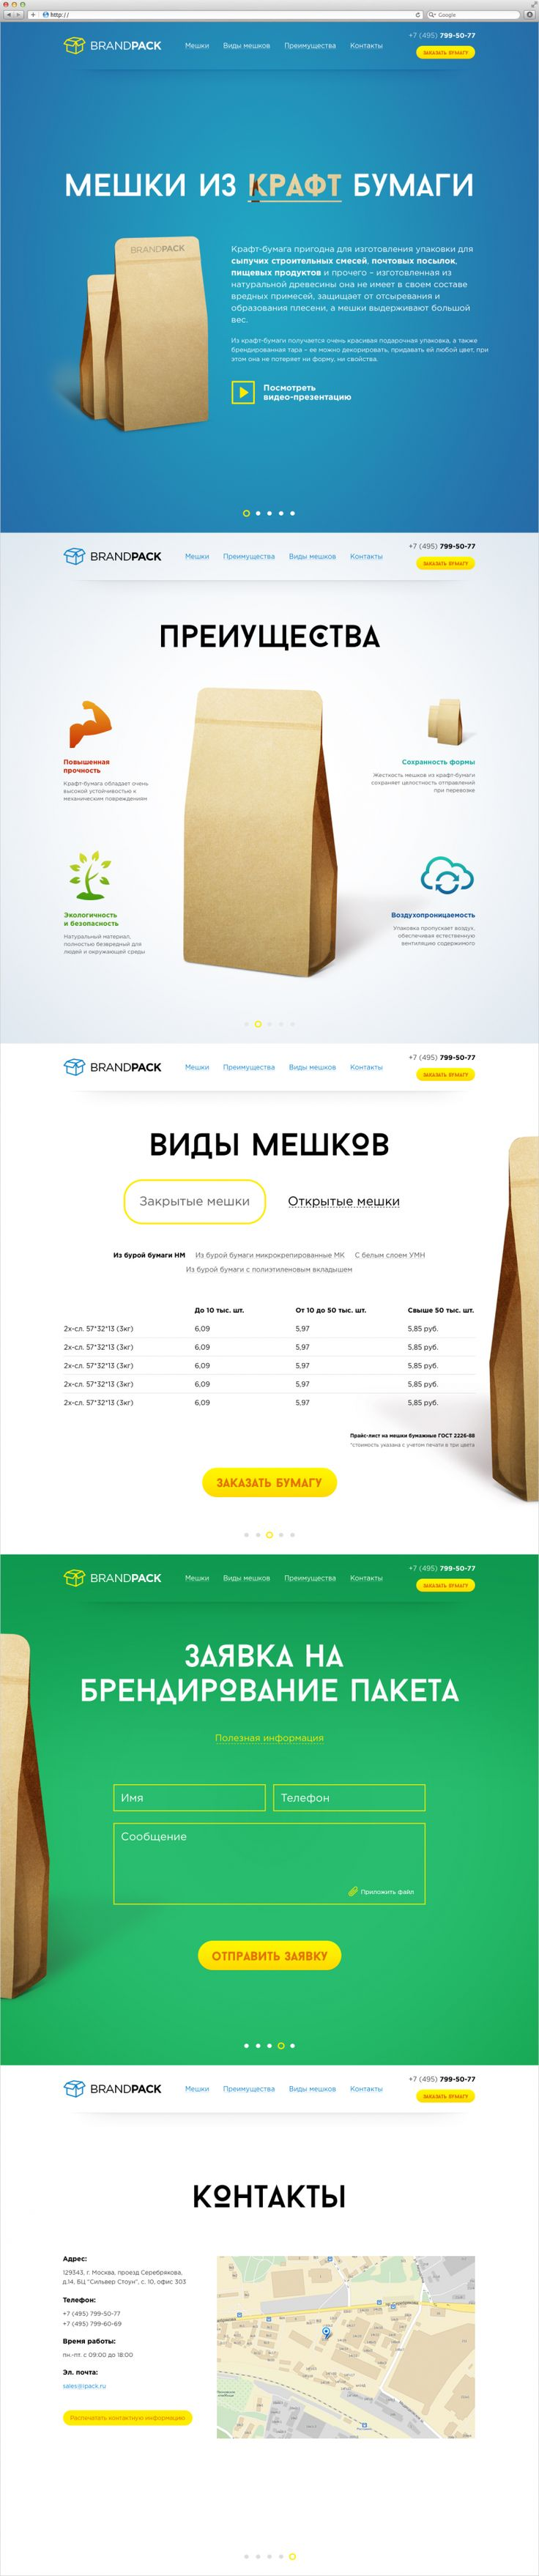 BrandPack, Сайт © Андрей Стаховский